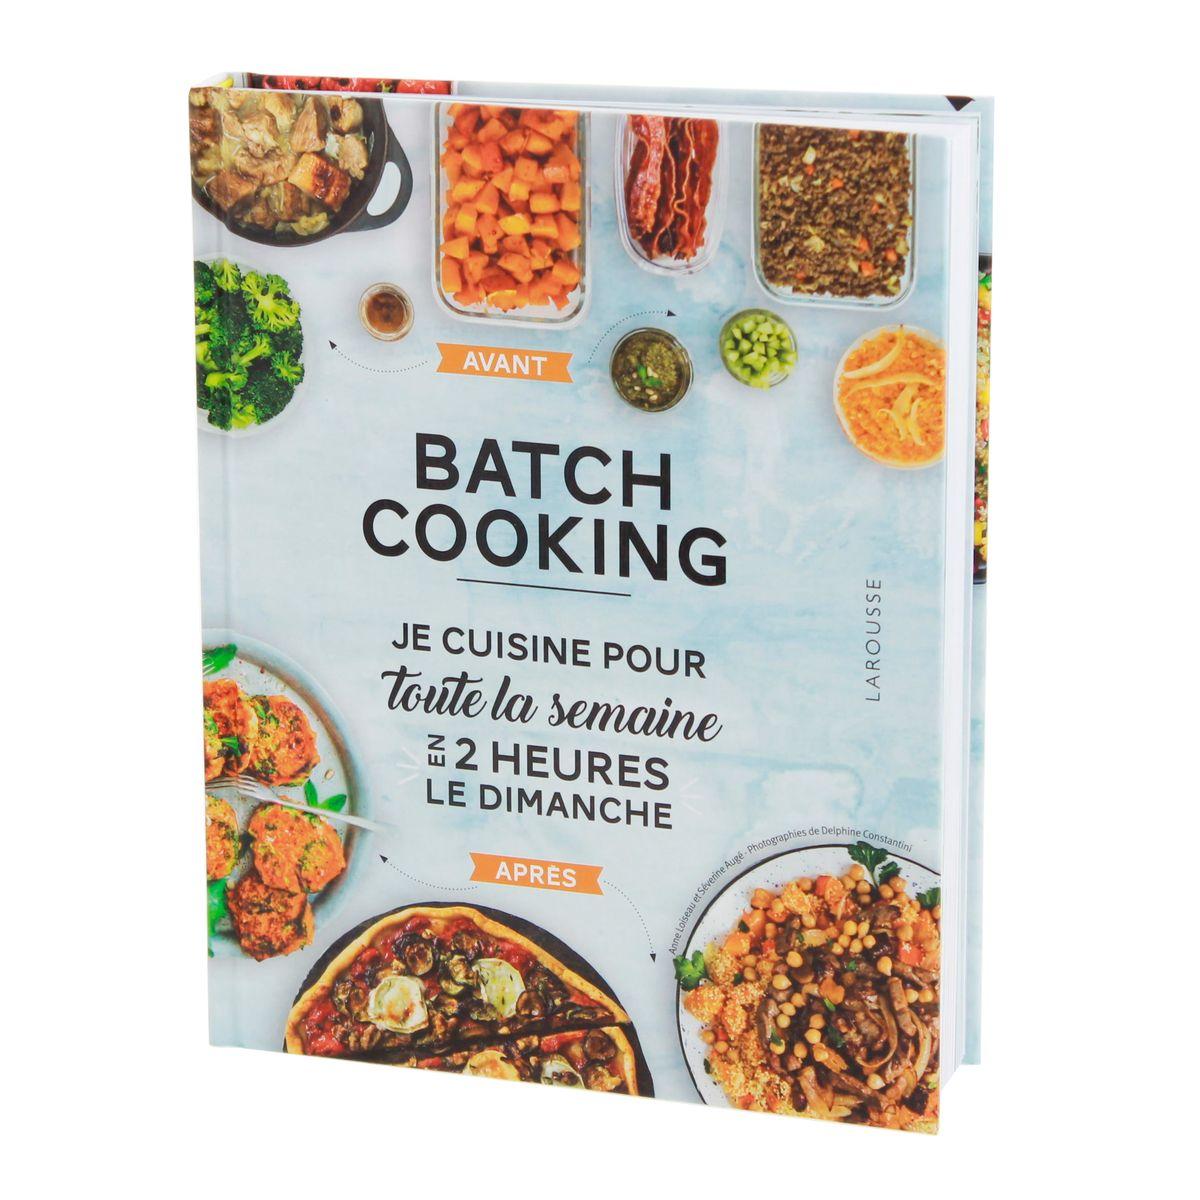 Batch cooking - Larousse